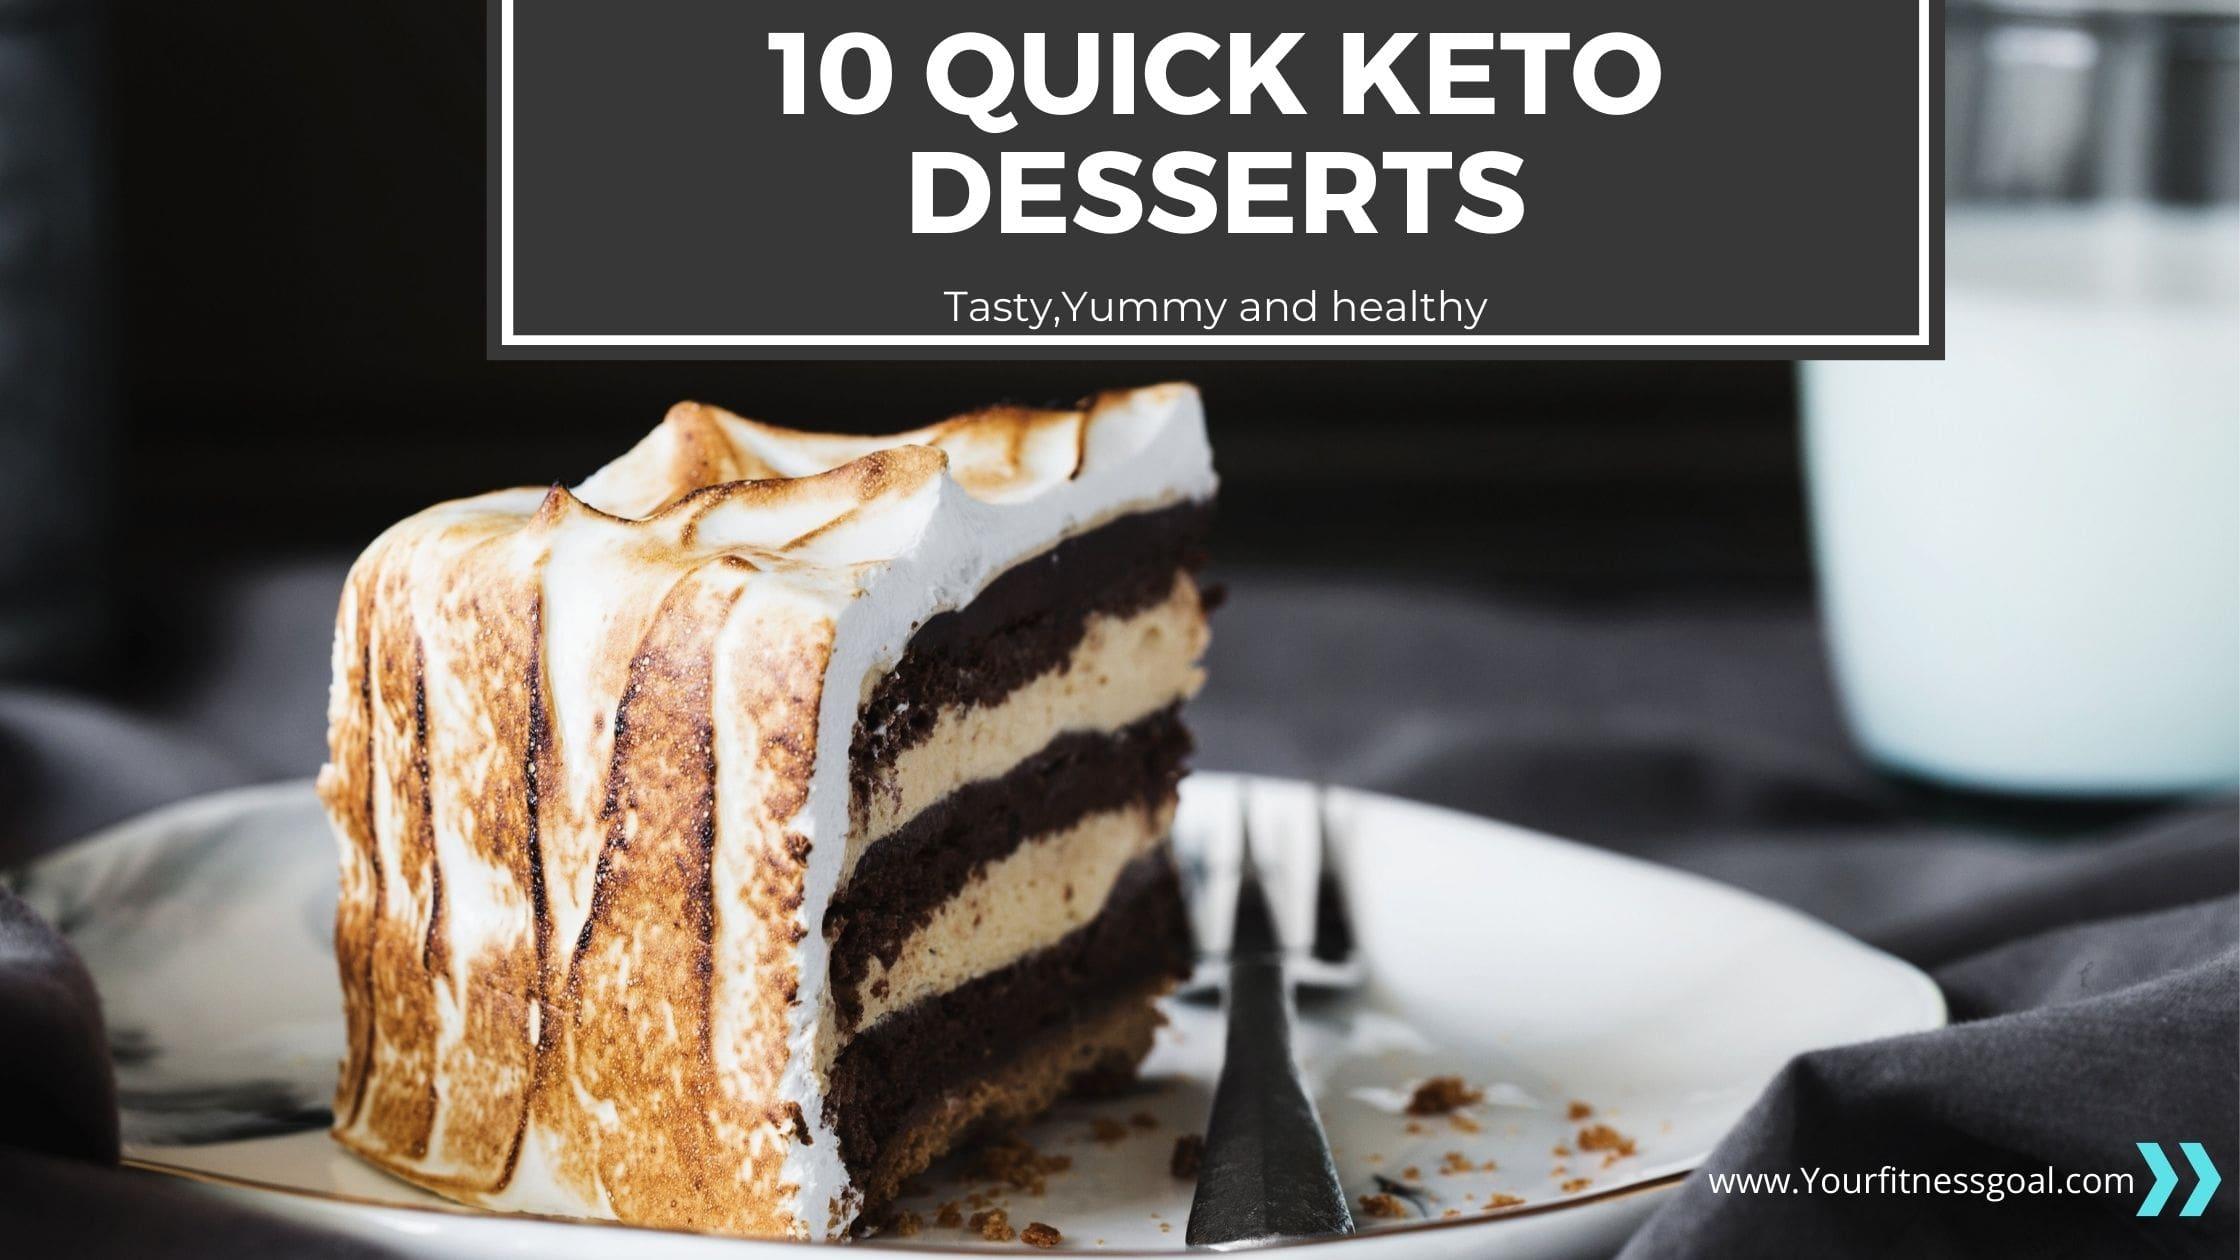 10 Quick Keto Dessert Recipes 2020 Best Low Carb Desserts Yourfitnessgoal